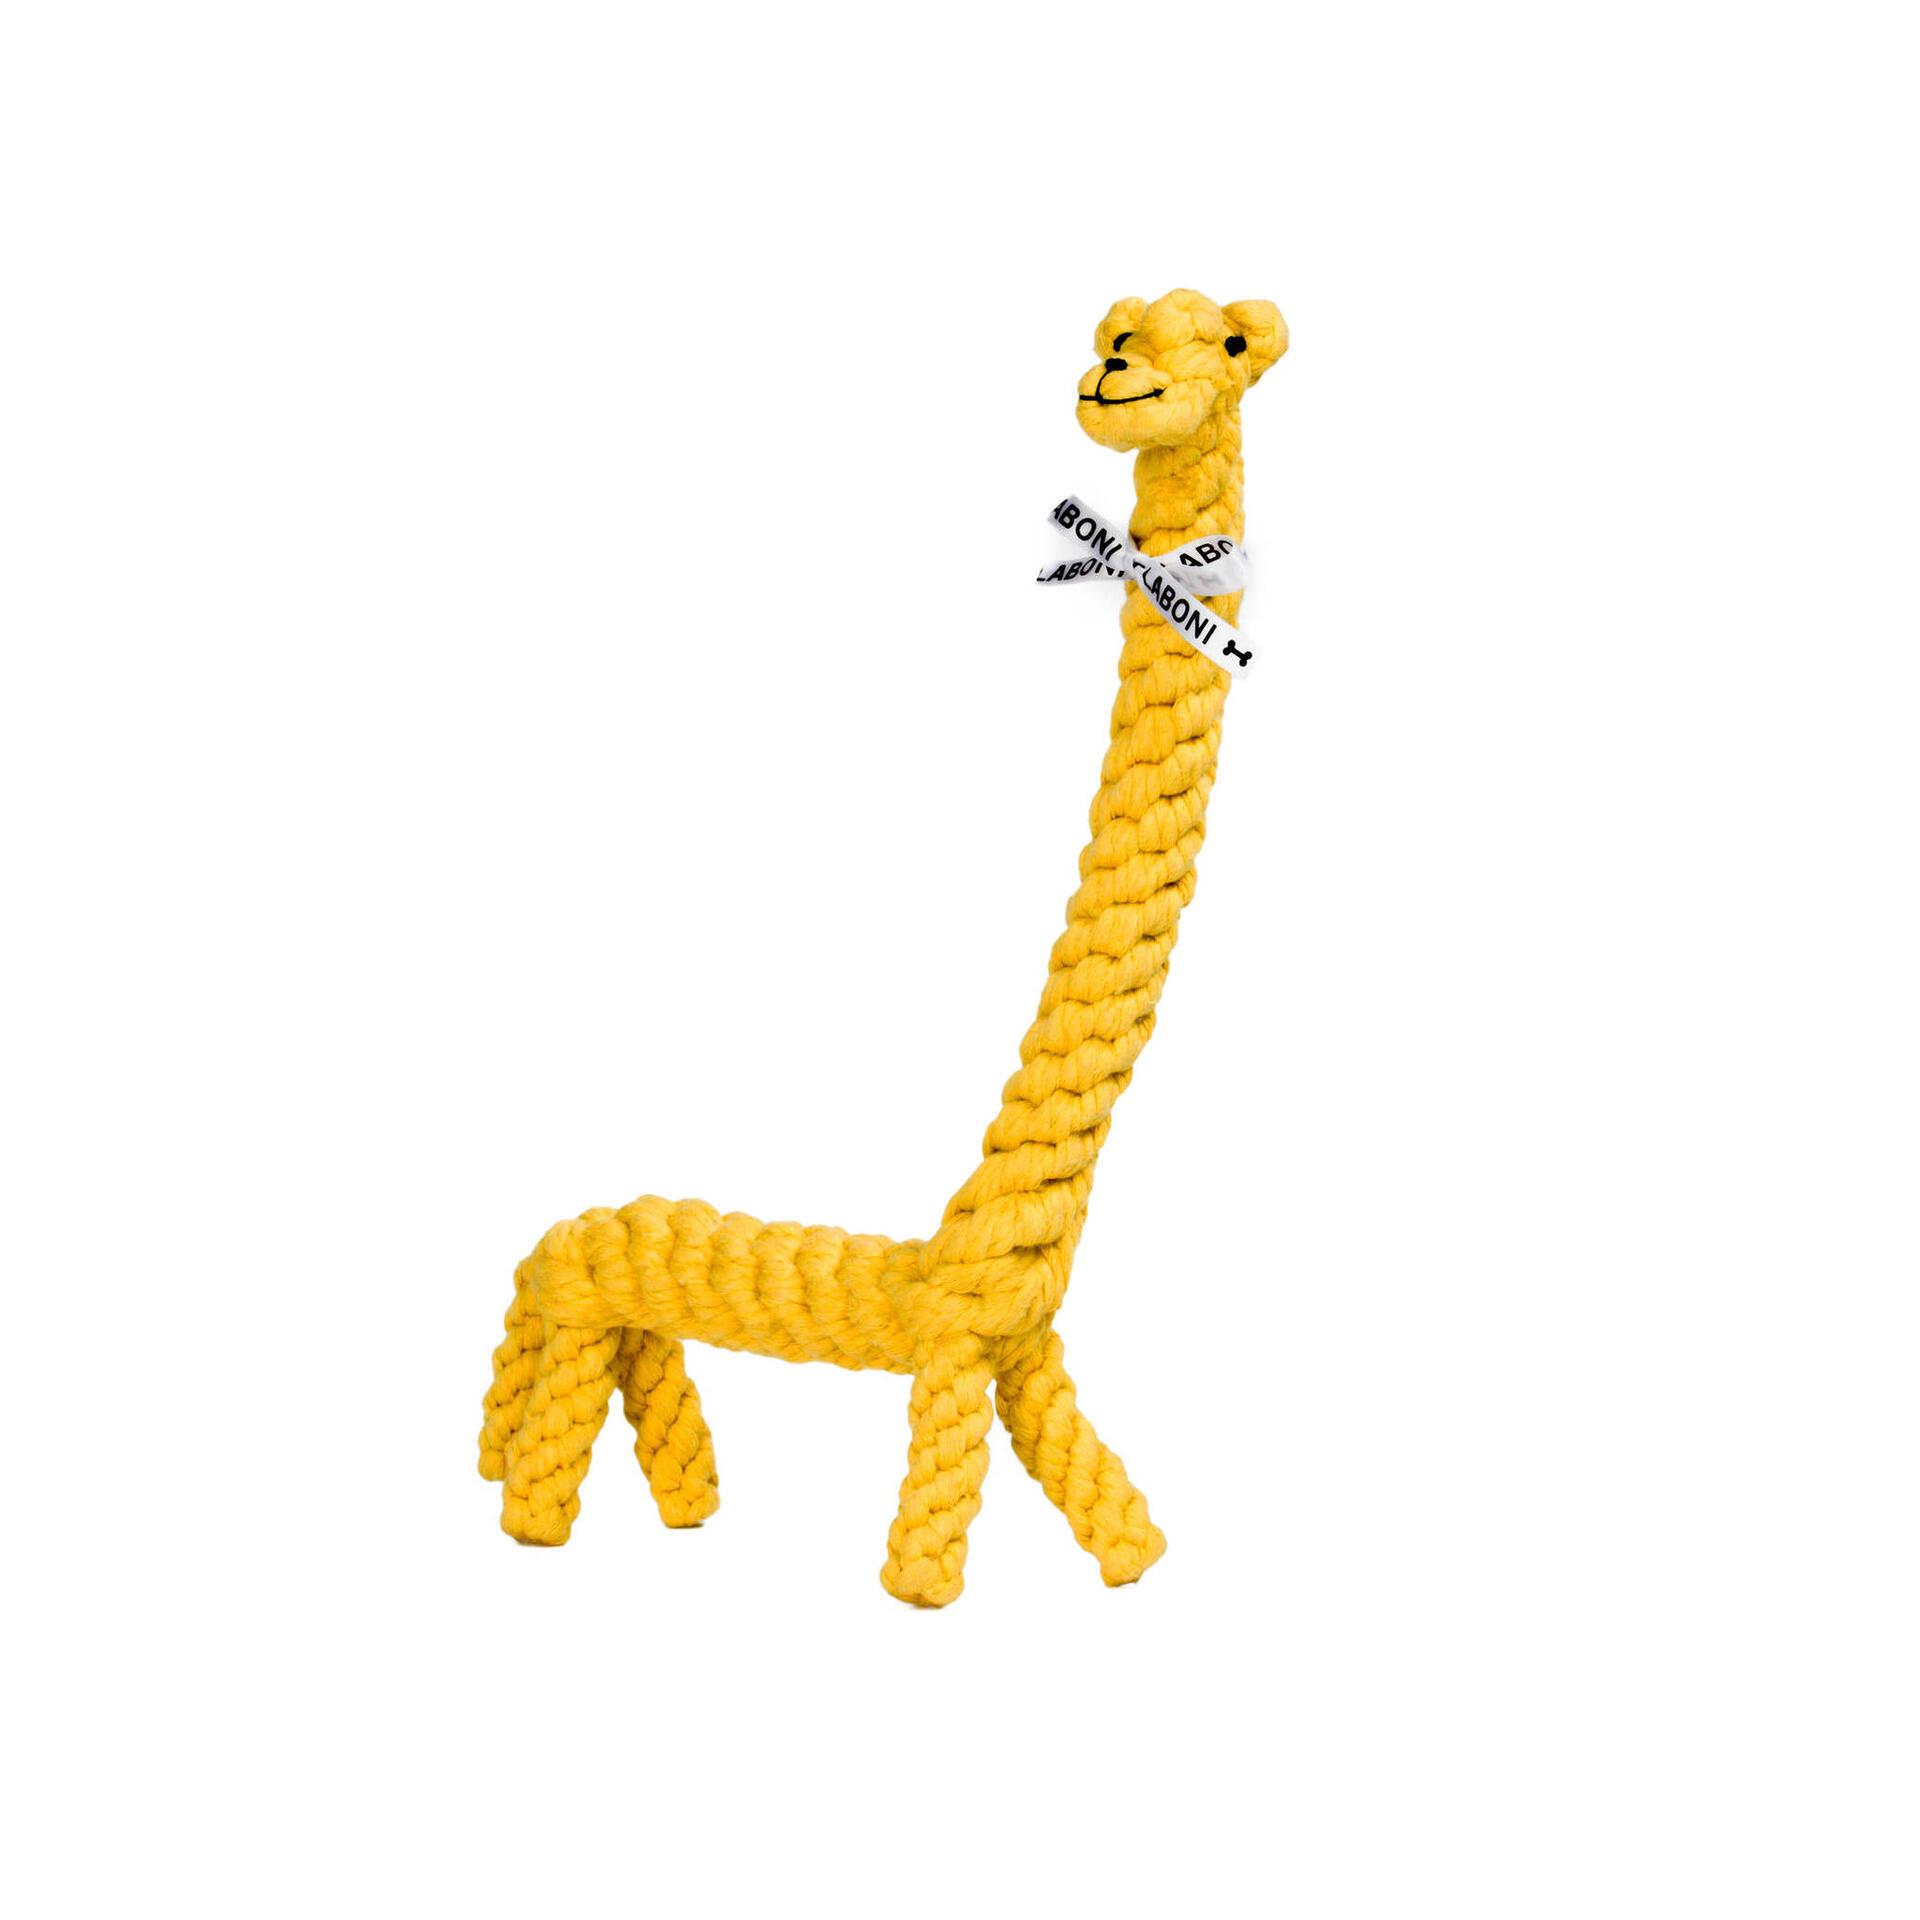 Laboni Hundespielzeug Greta Giraffe gelb 40cm